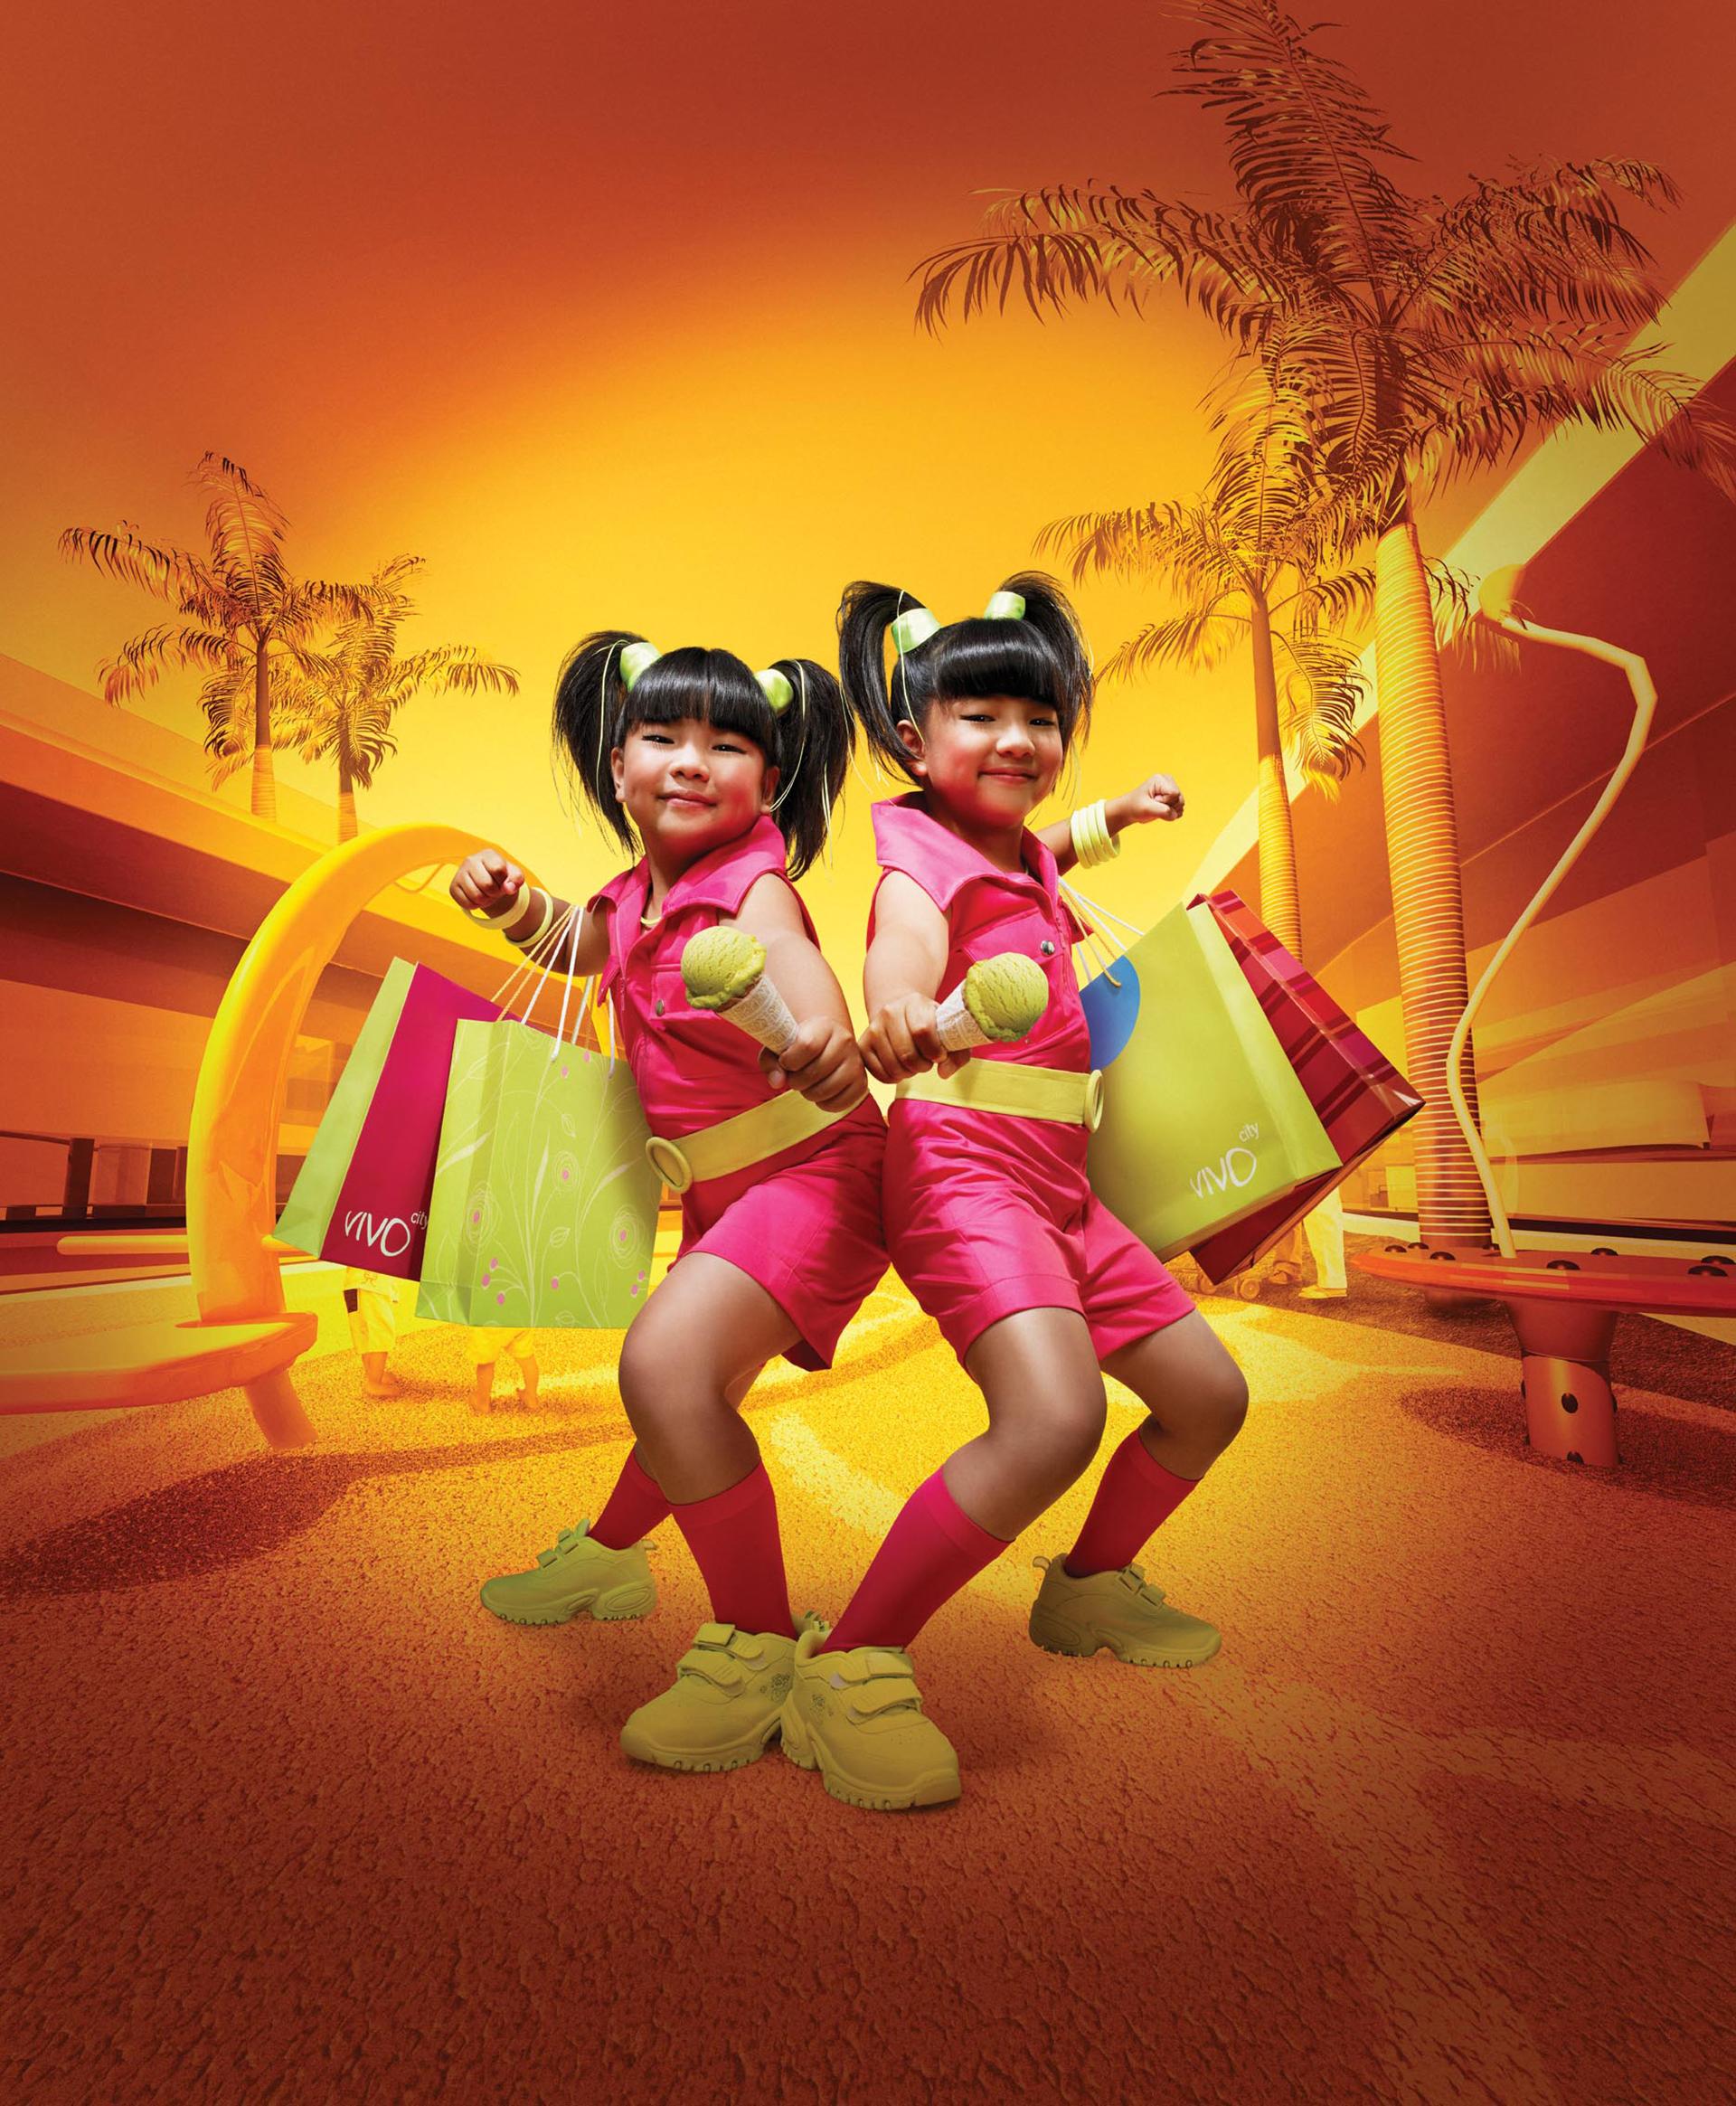 046c Vivo twins-3d-fn-1